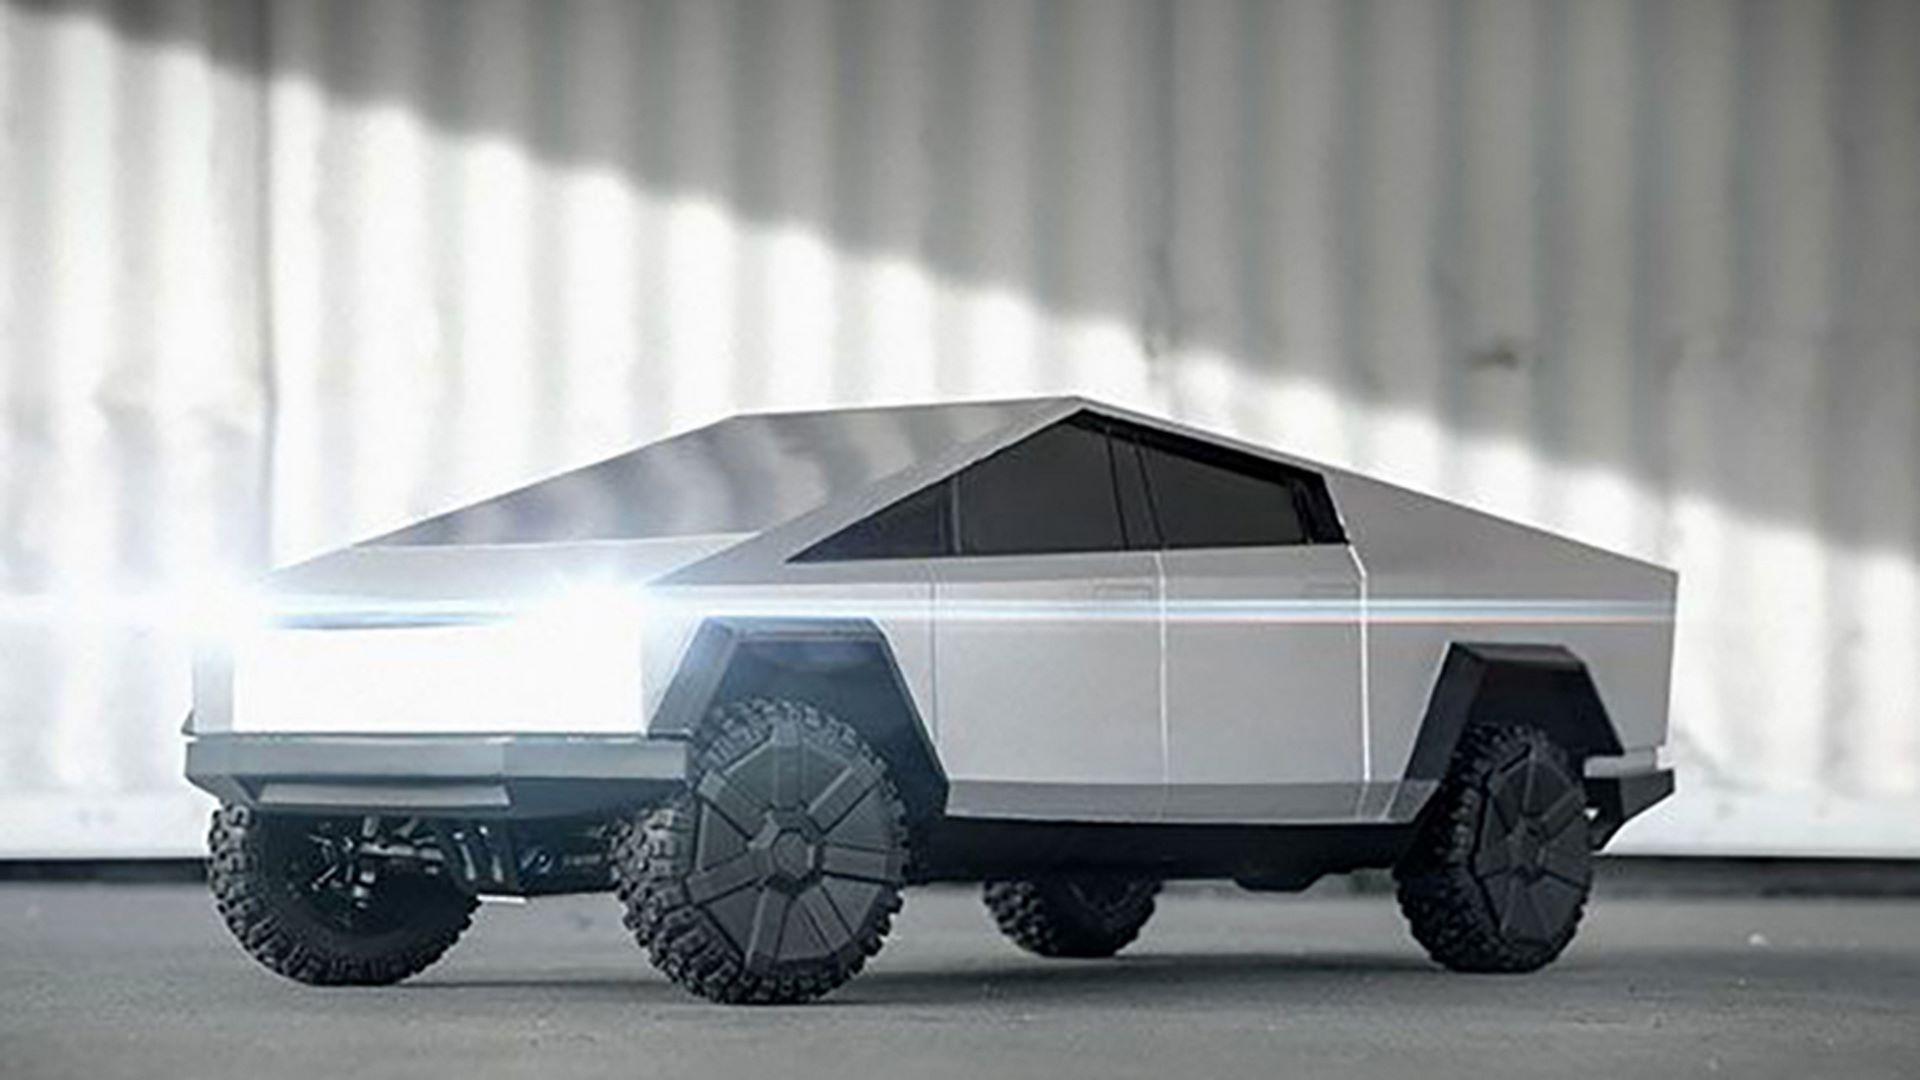 Hot-Wheels-RC-Tesla-Cybertruck-7